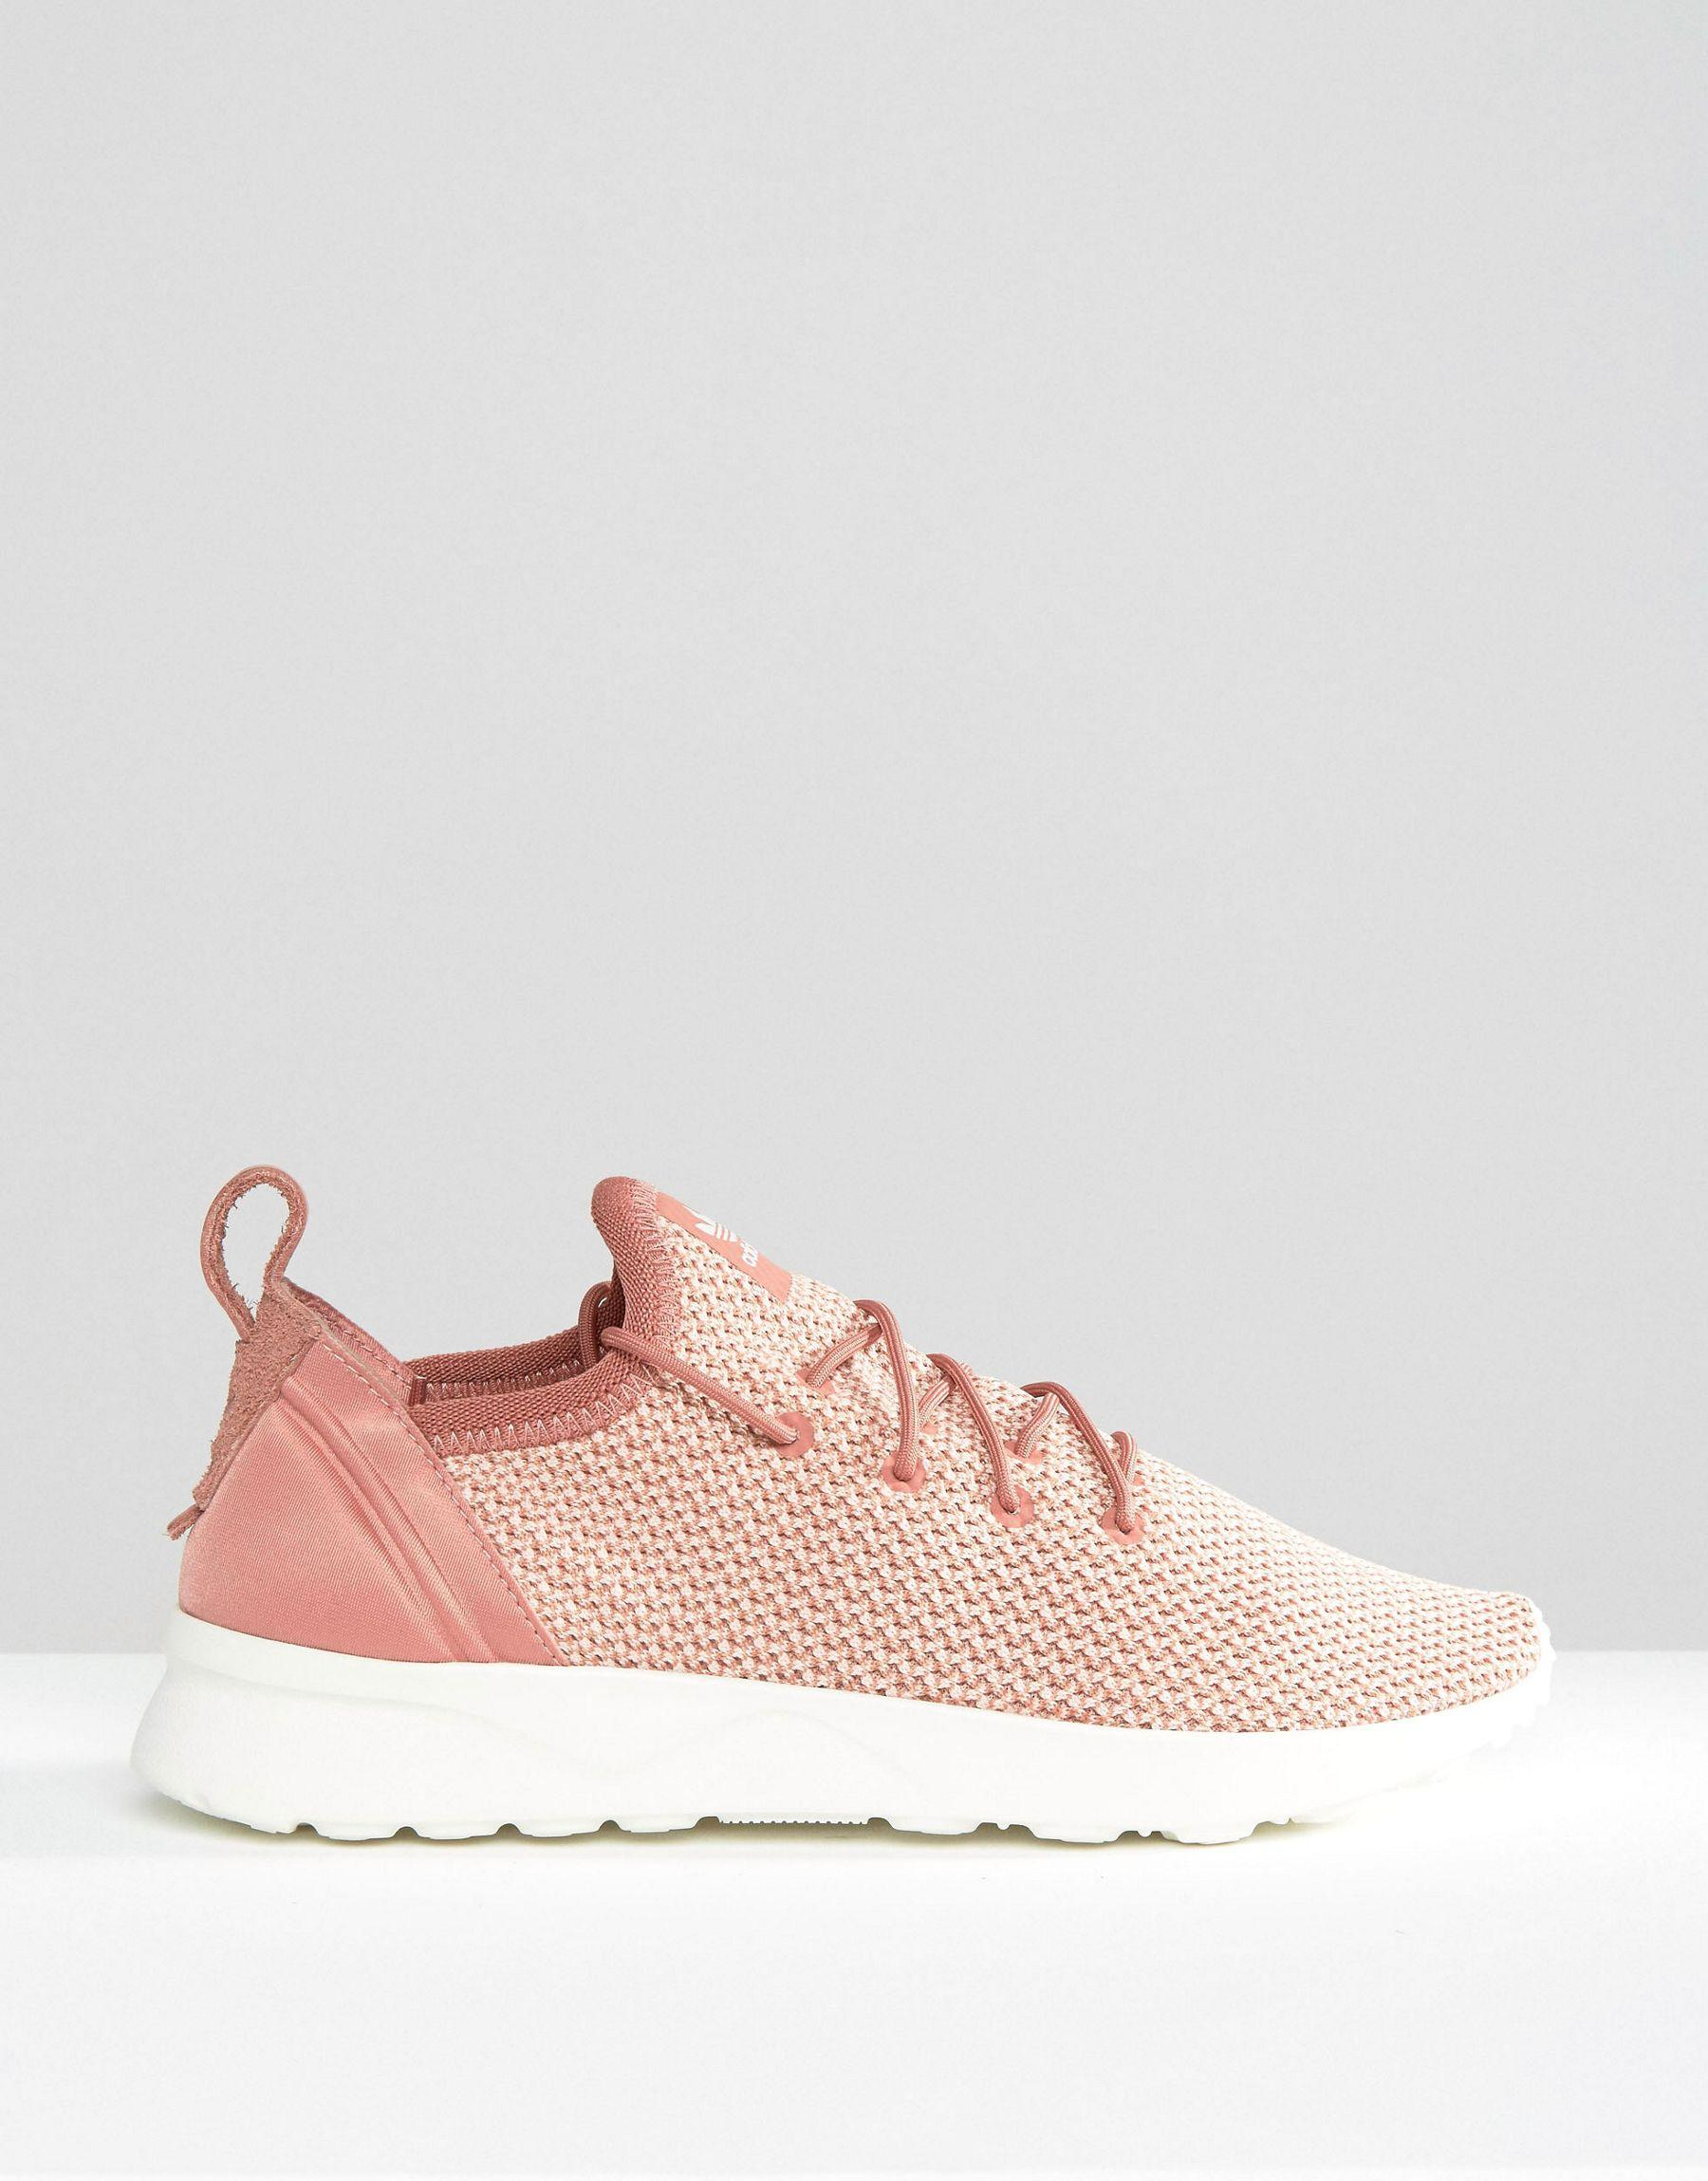 8bc52a535348 ... low price dusty pink women shoes hfr5439 lyst adidas originals originals  dusky pink zx flux adv